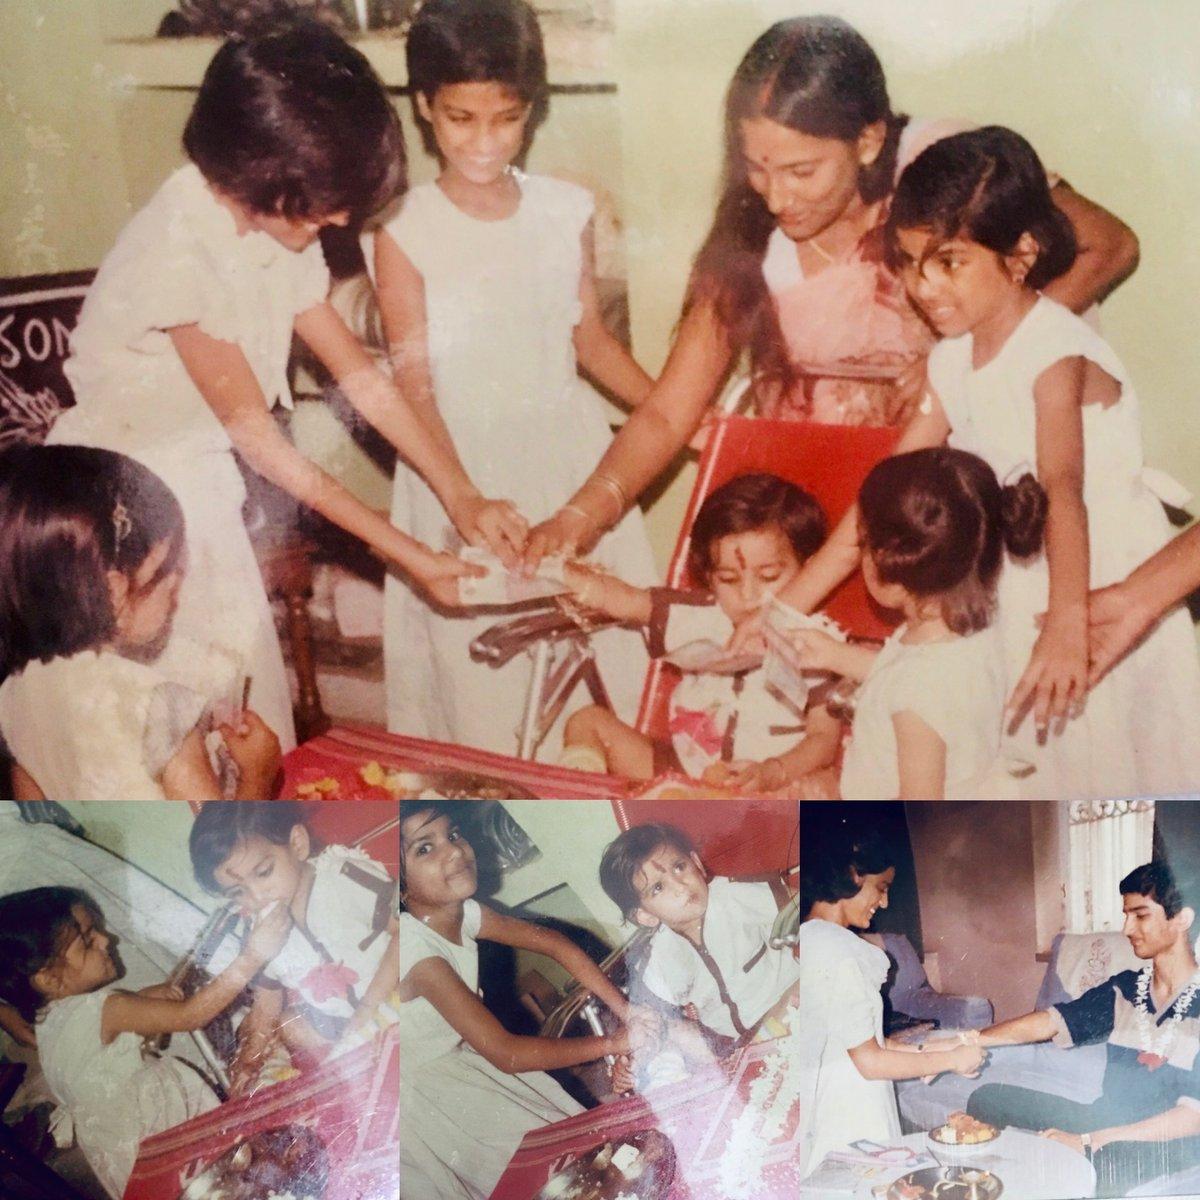 Happy Rakshabandhan mera sweet sa baby... bahut pyaar karte hain hum aapko jaan... aur hamesha karte rahenge... you were, you are and you will always be our PRIDE! ❤️ @sushantsinghrajput #HappyRakshaBandhan